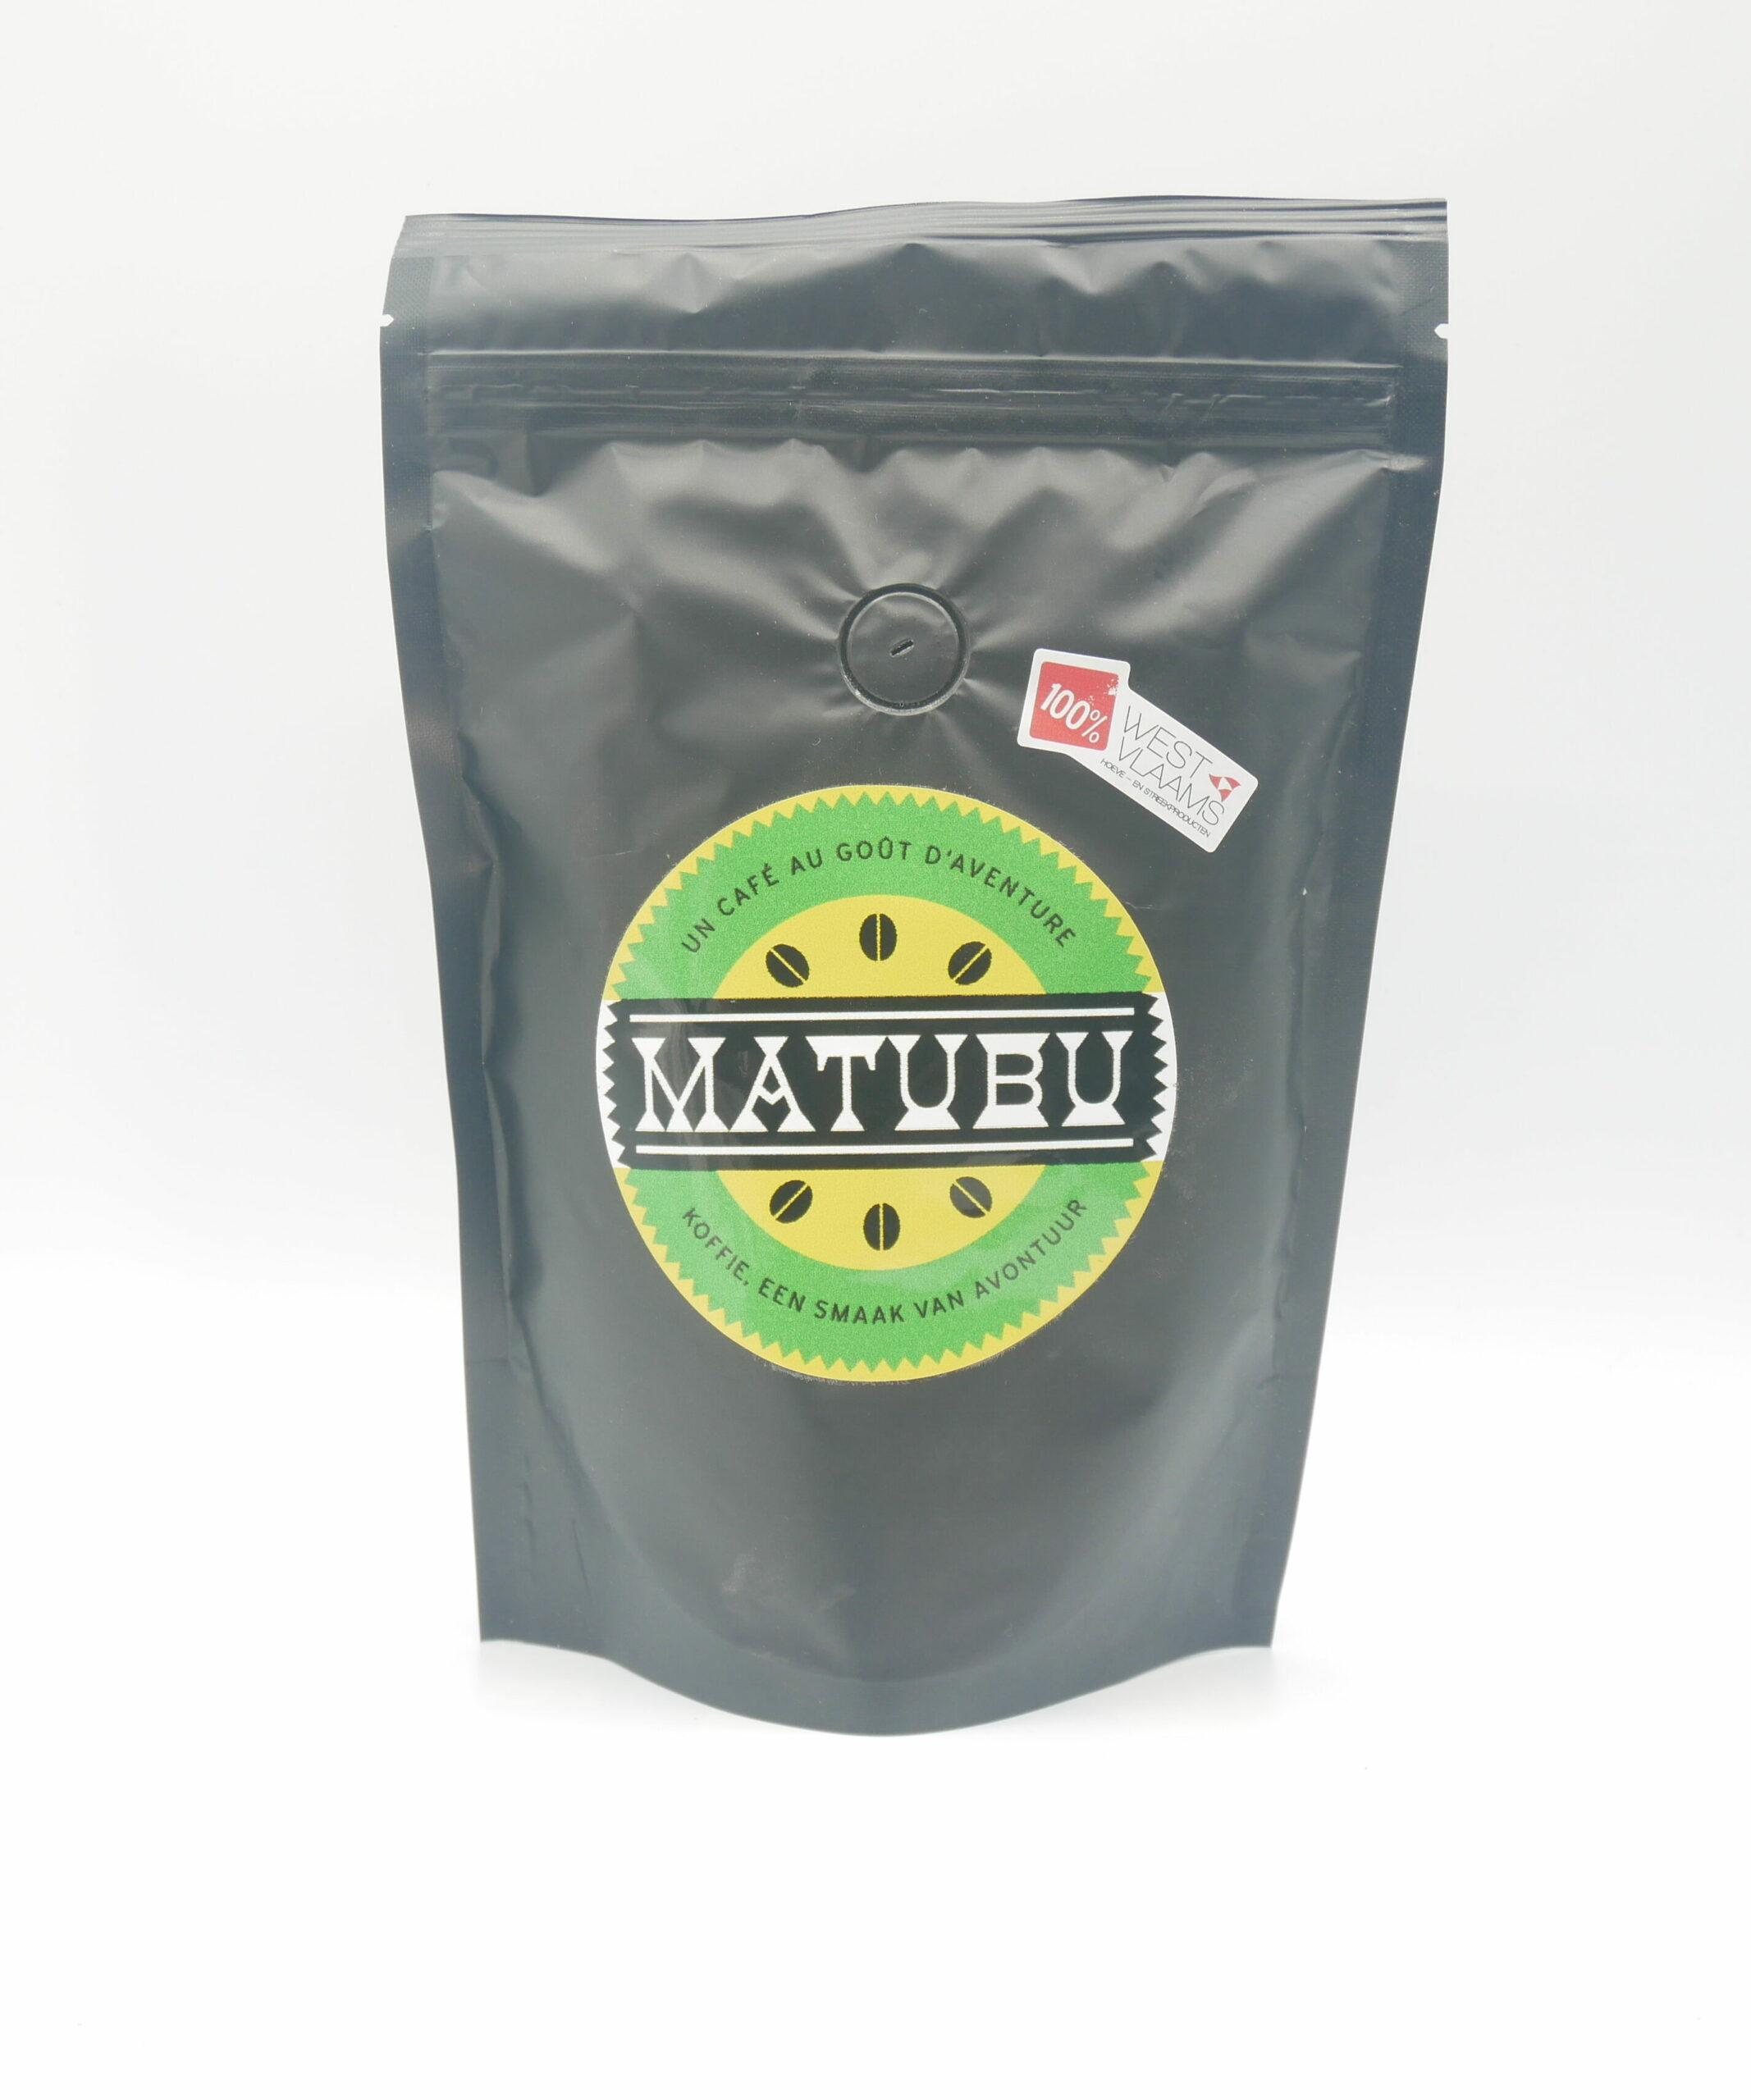 Image Coffee Matubu Caspar Blend